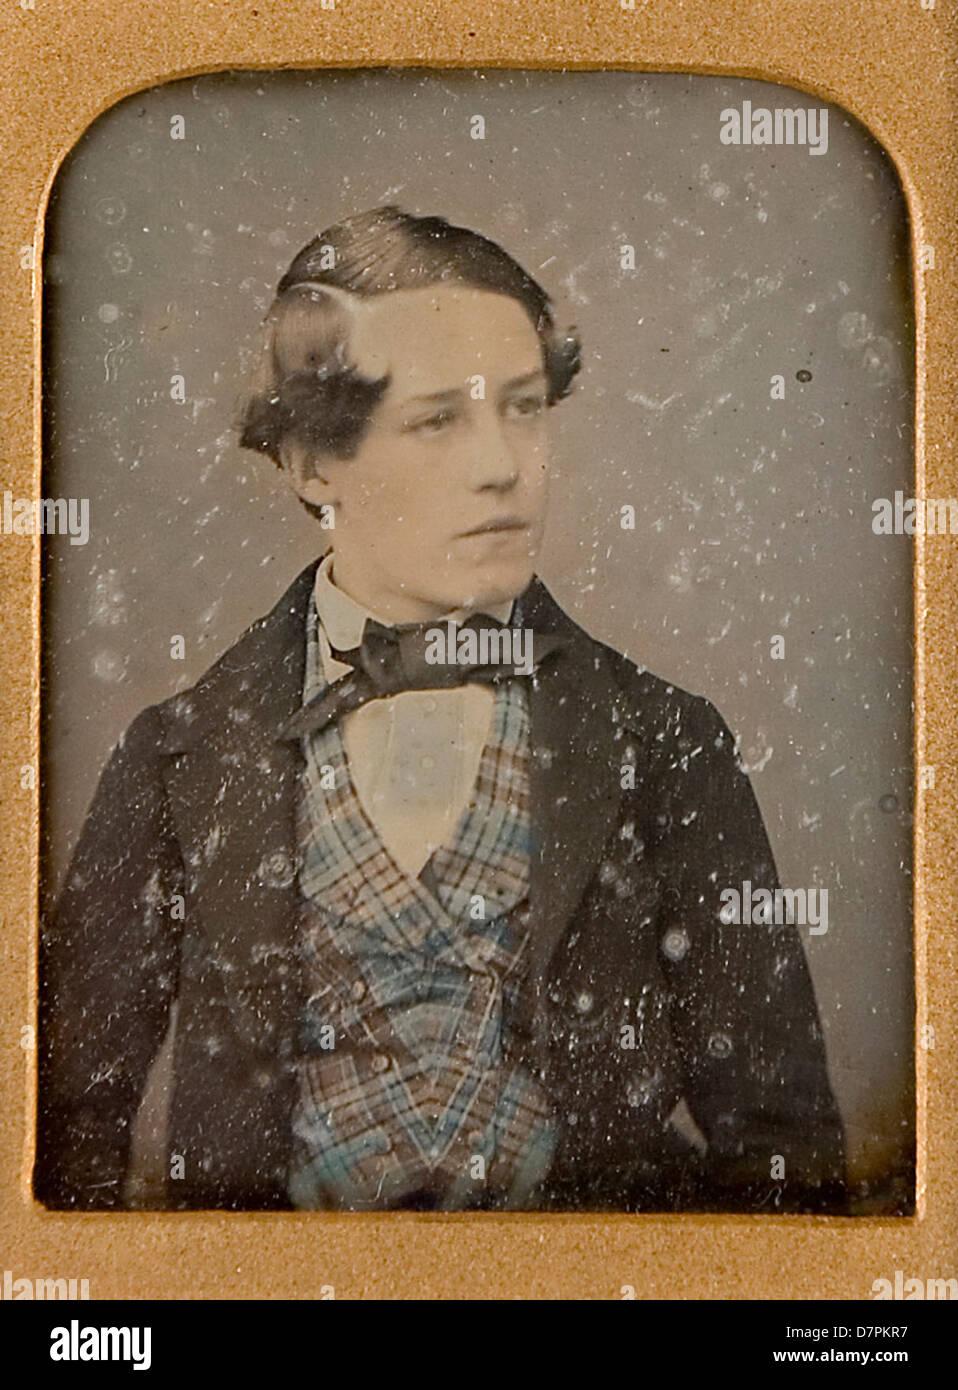 John Brown, photographer Richard Beard - Stock Image